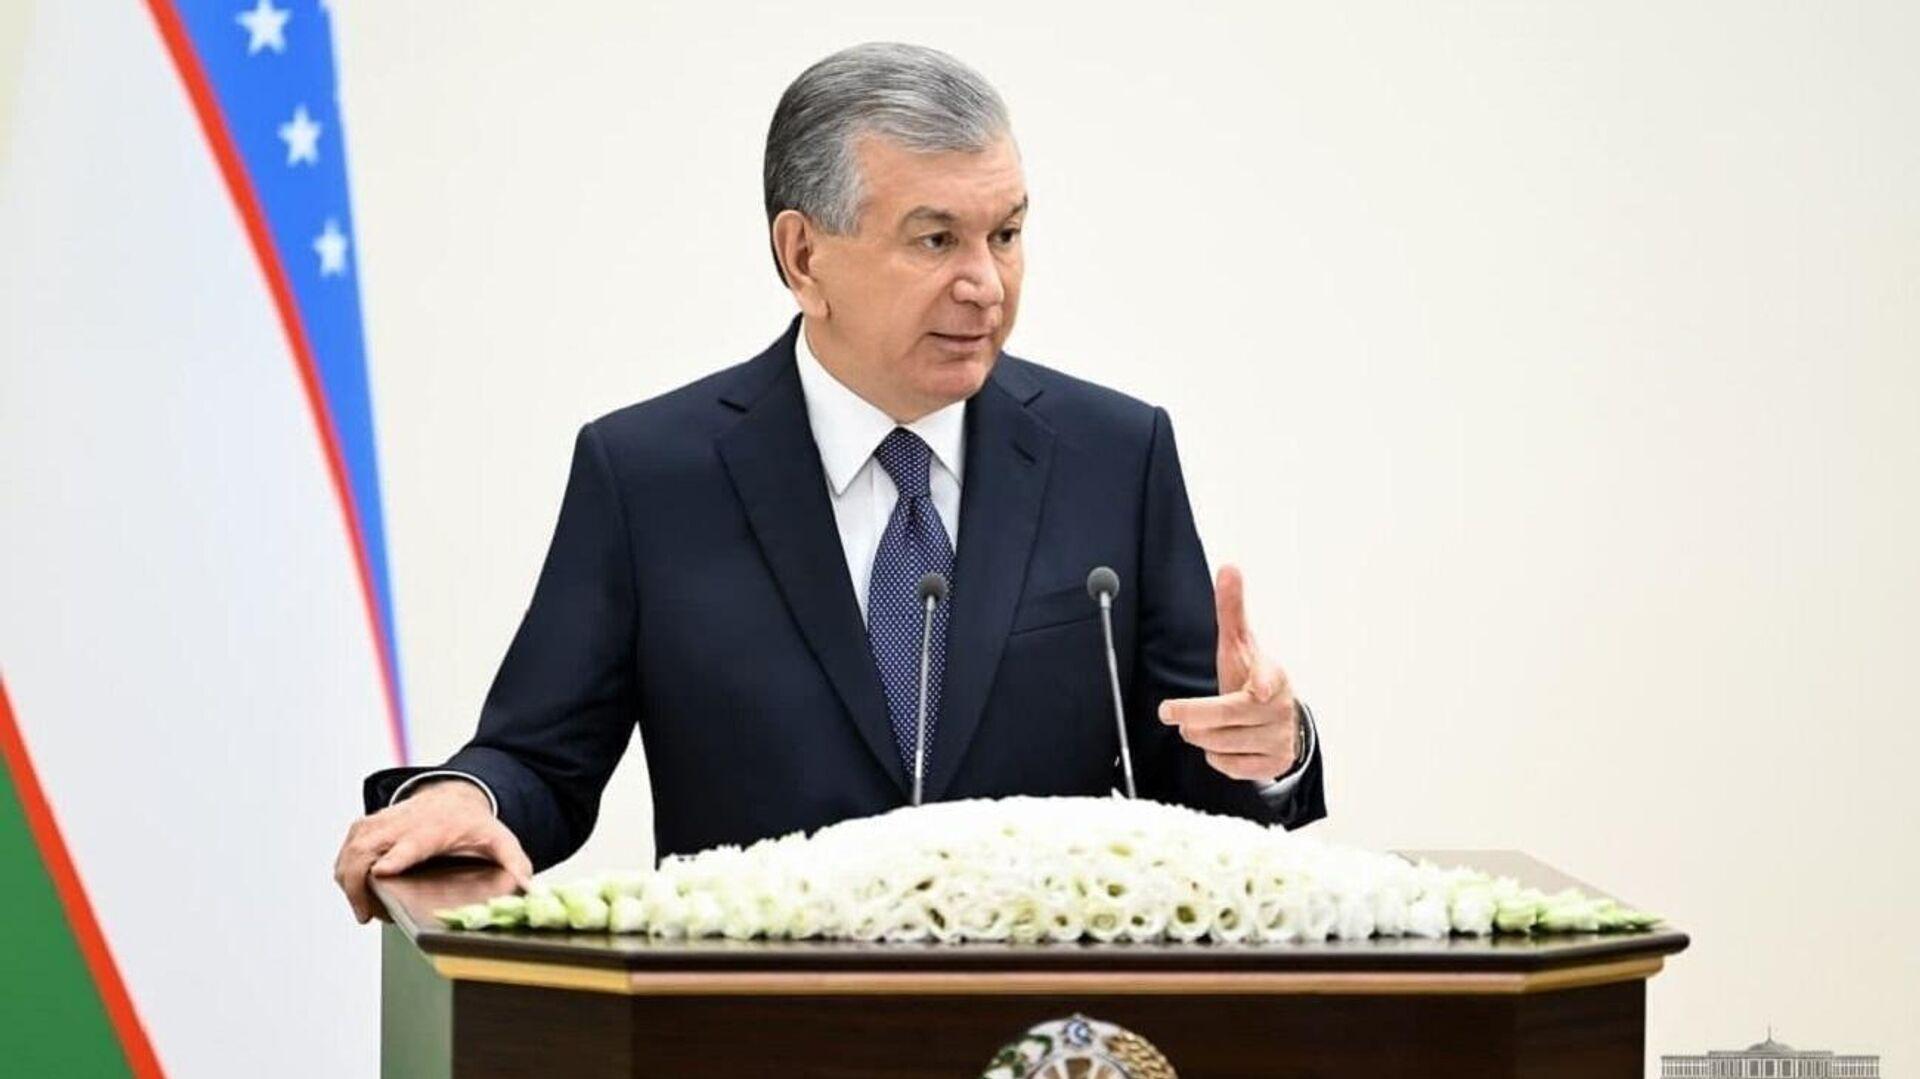 Президент Узбекистана Шавкат Мирзиёев - Sputnik Узбекистан, 1920, 18.06.2021